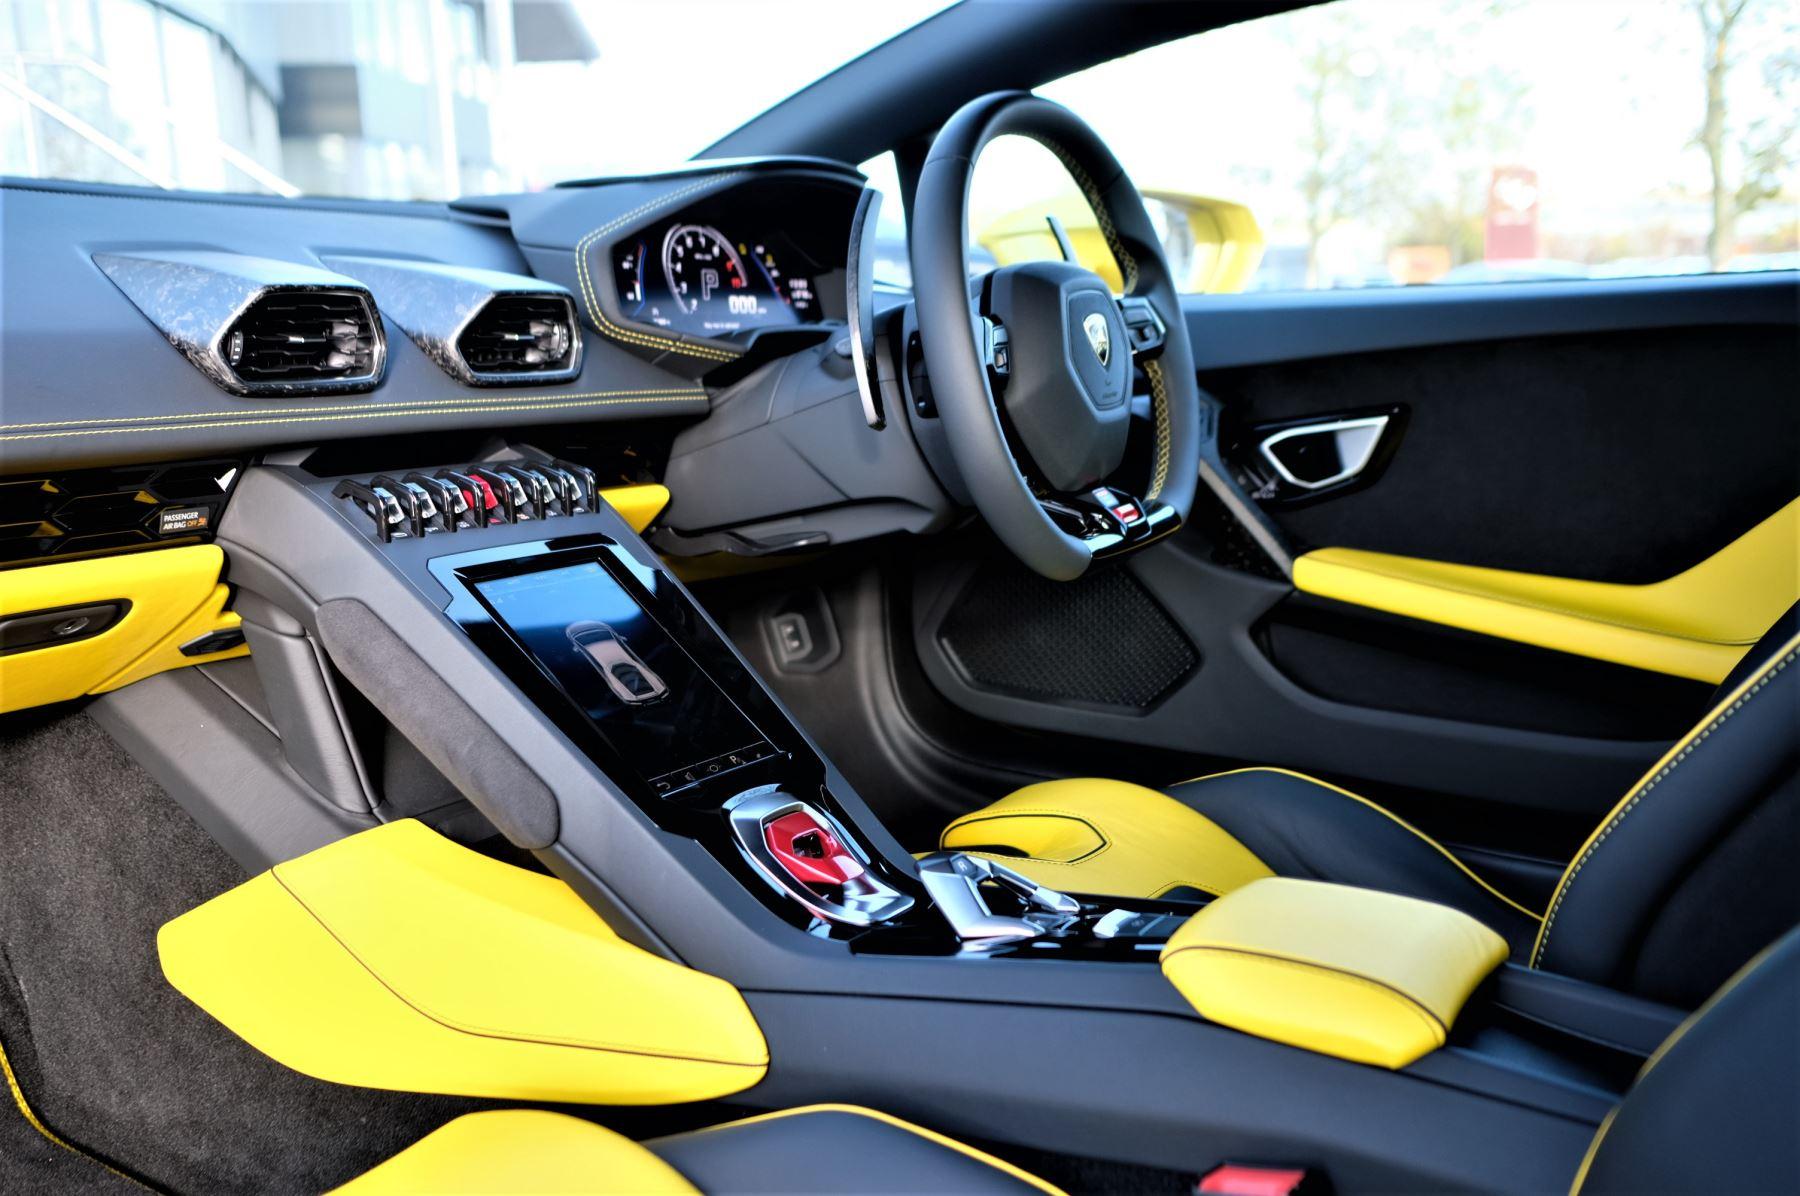 Lamborghini Huracan EVO 5.2 V10 610 2dr Auto RWD image 7